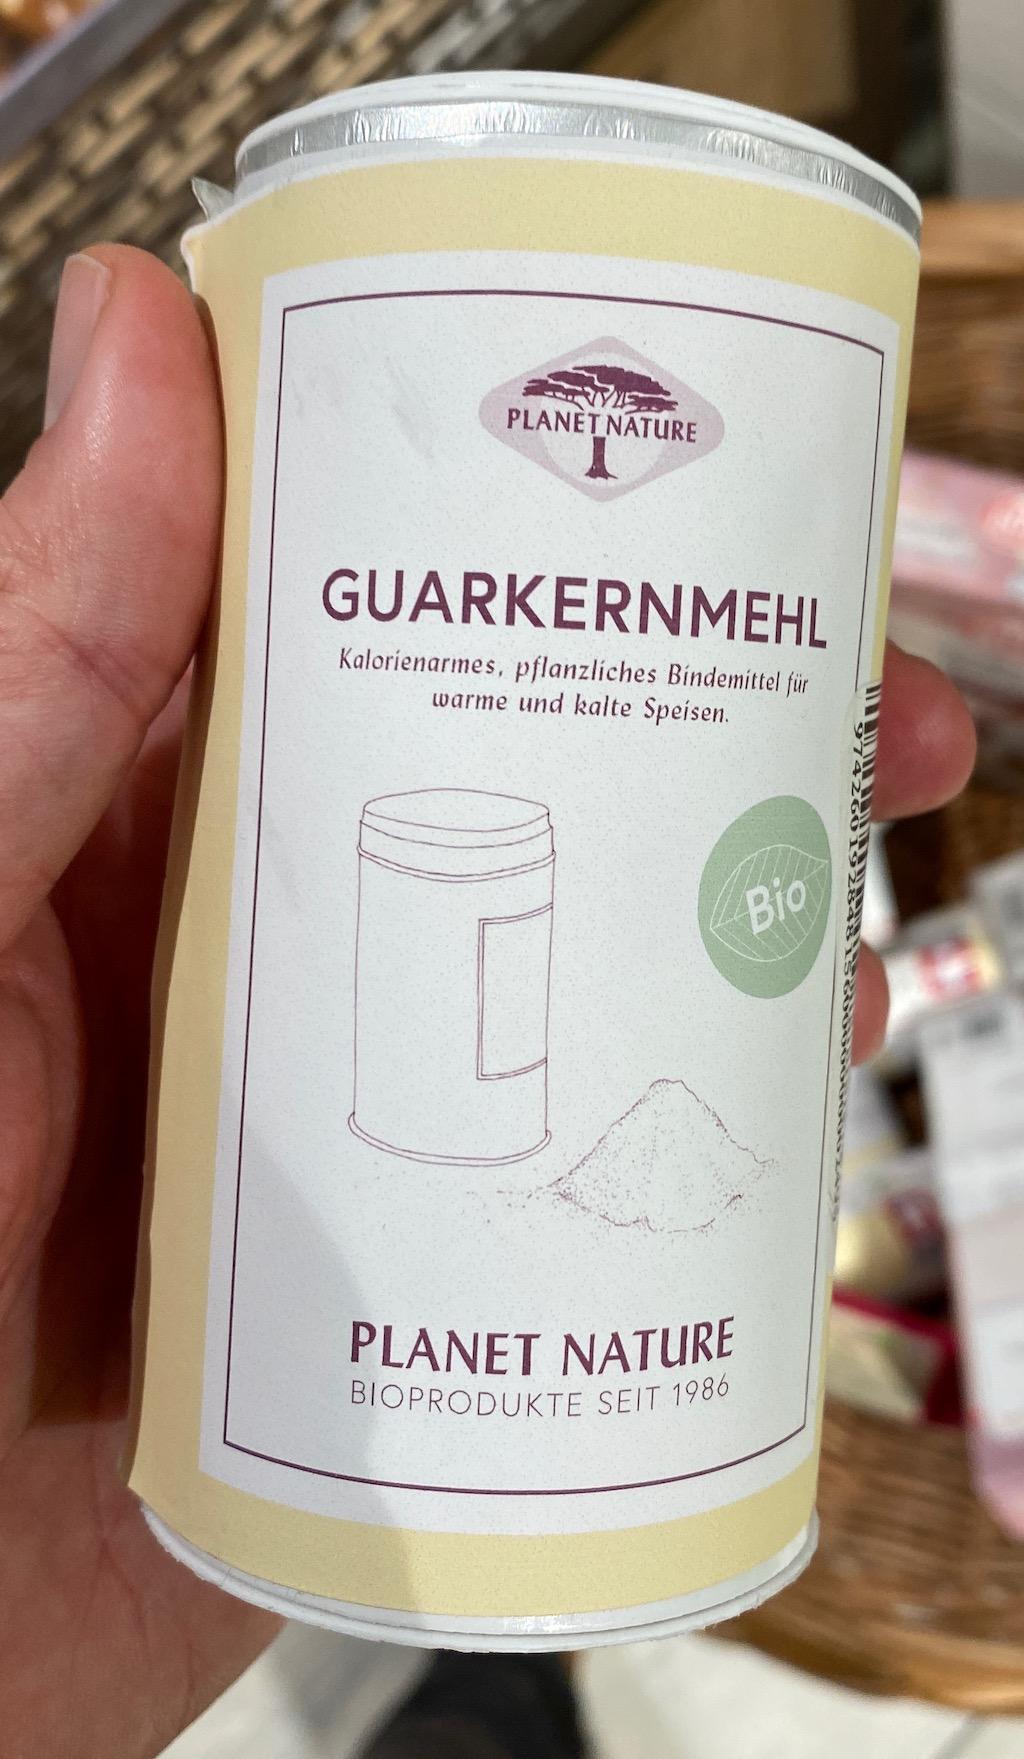 Planet Nature Bio Guarkernmehl Planet Nature